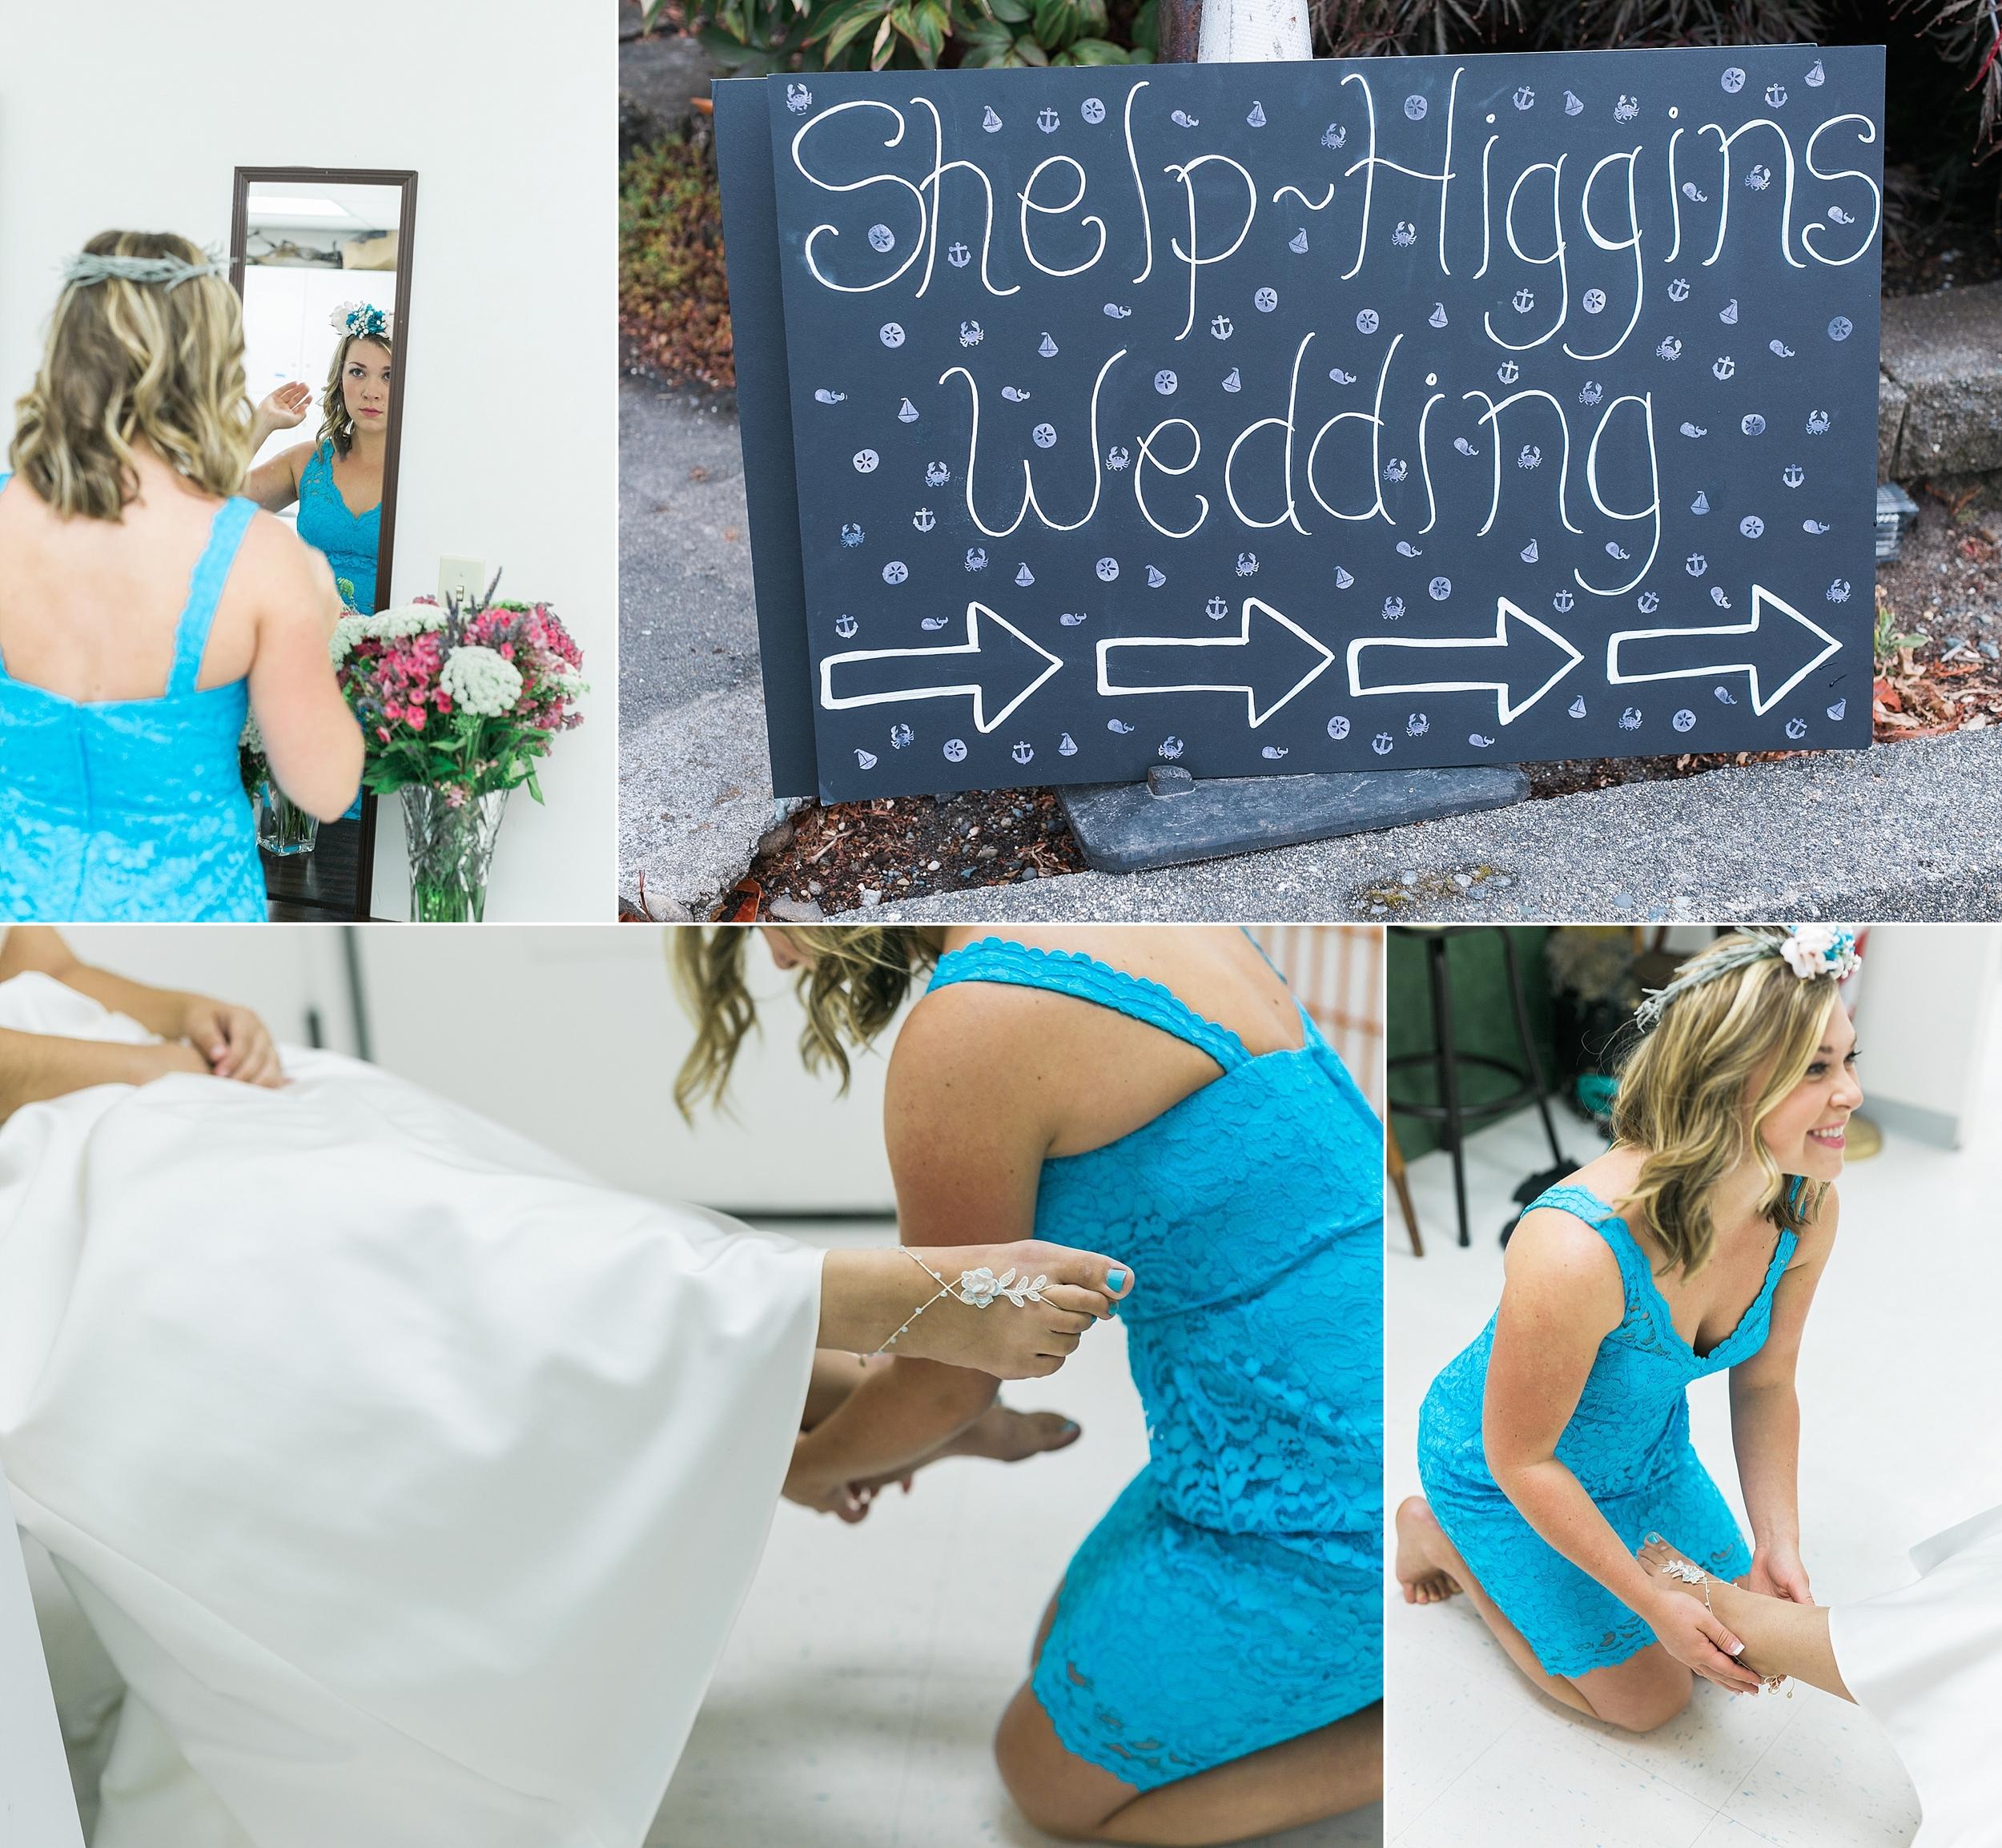 ashley vos photography seattle area wedding photographer_0619.jpg